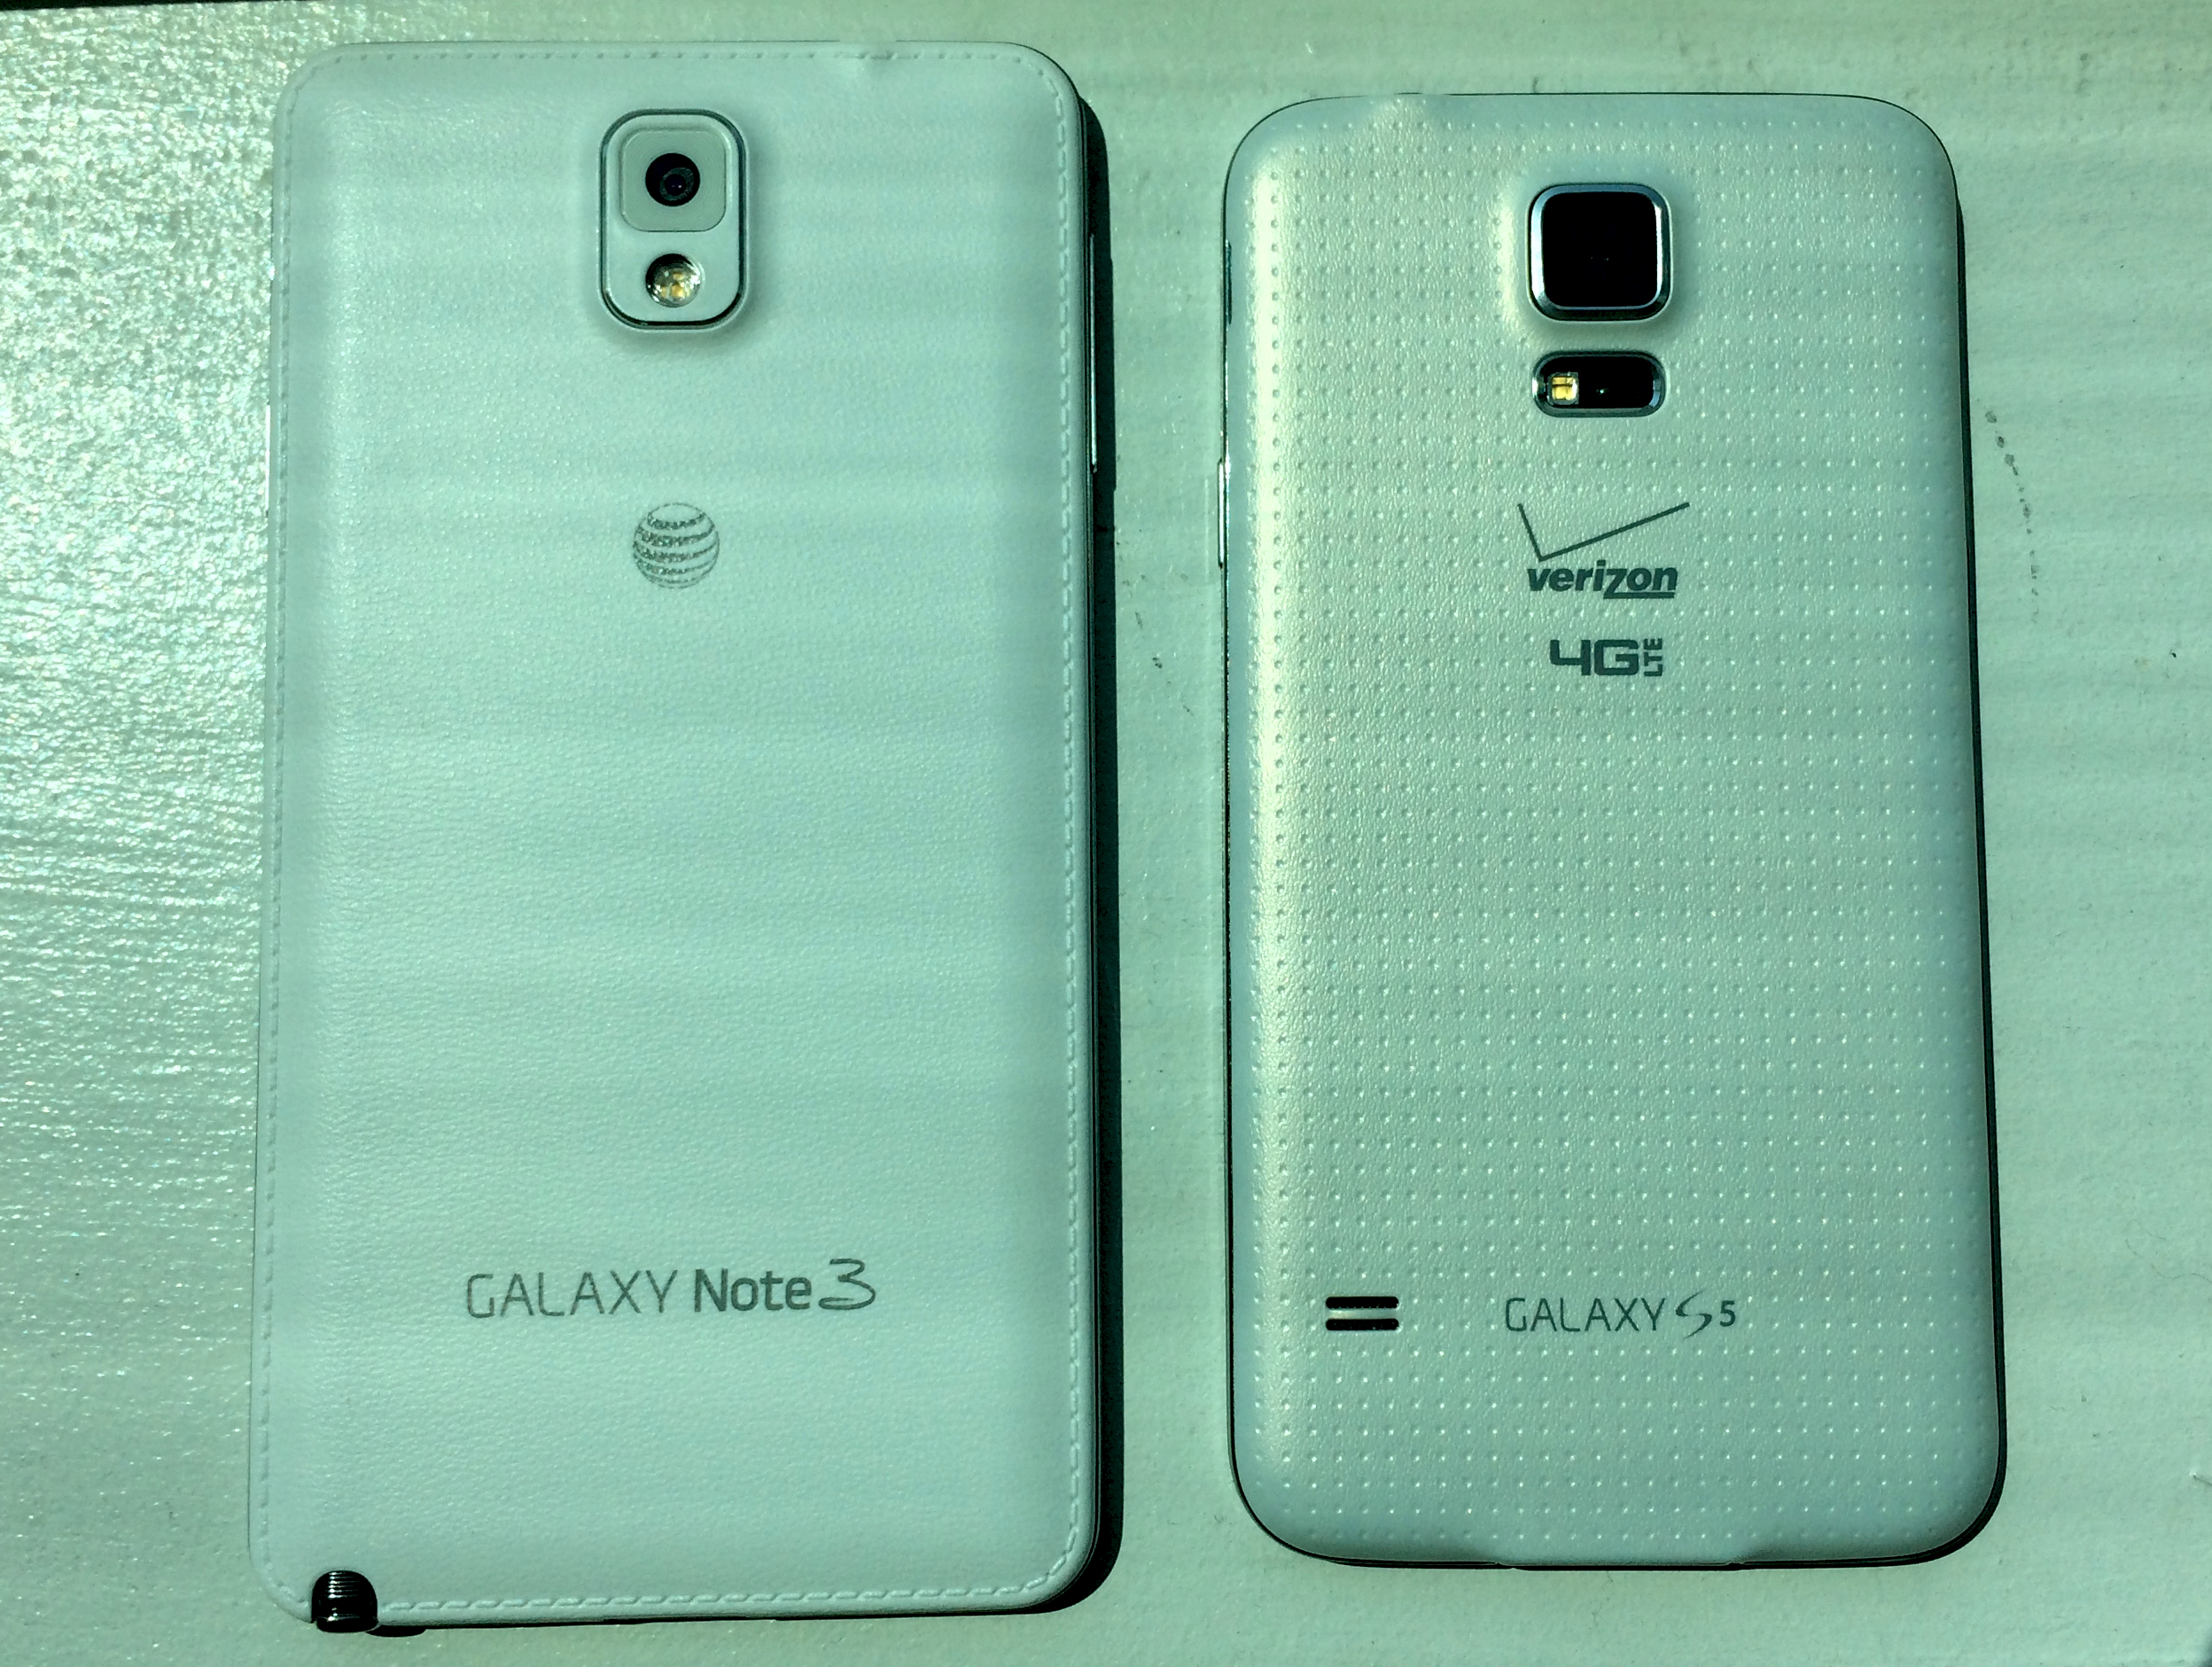 Galaxy Note 4 Design